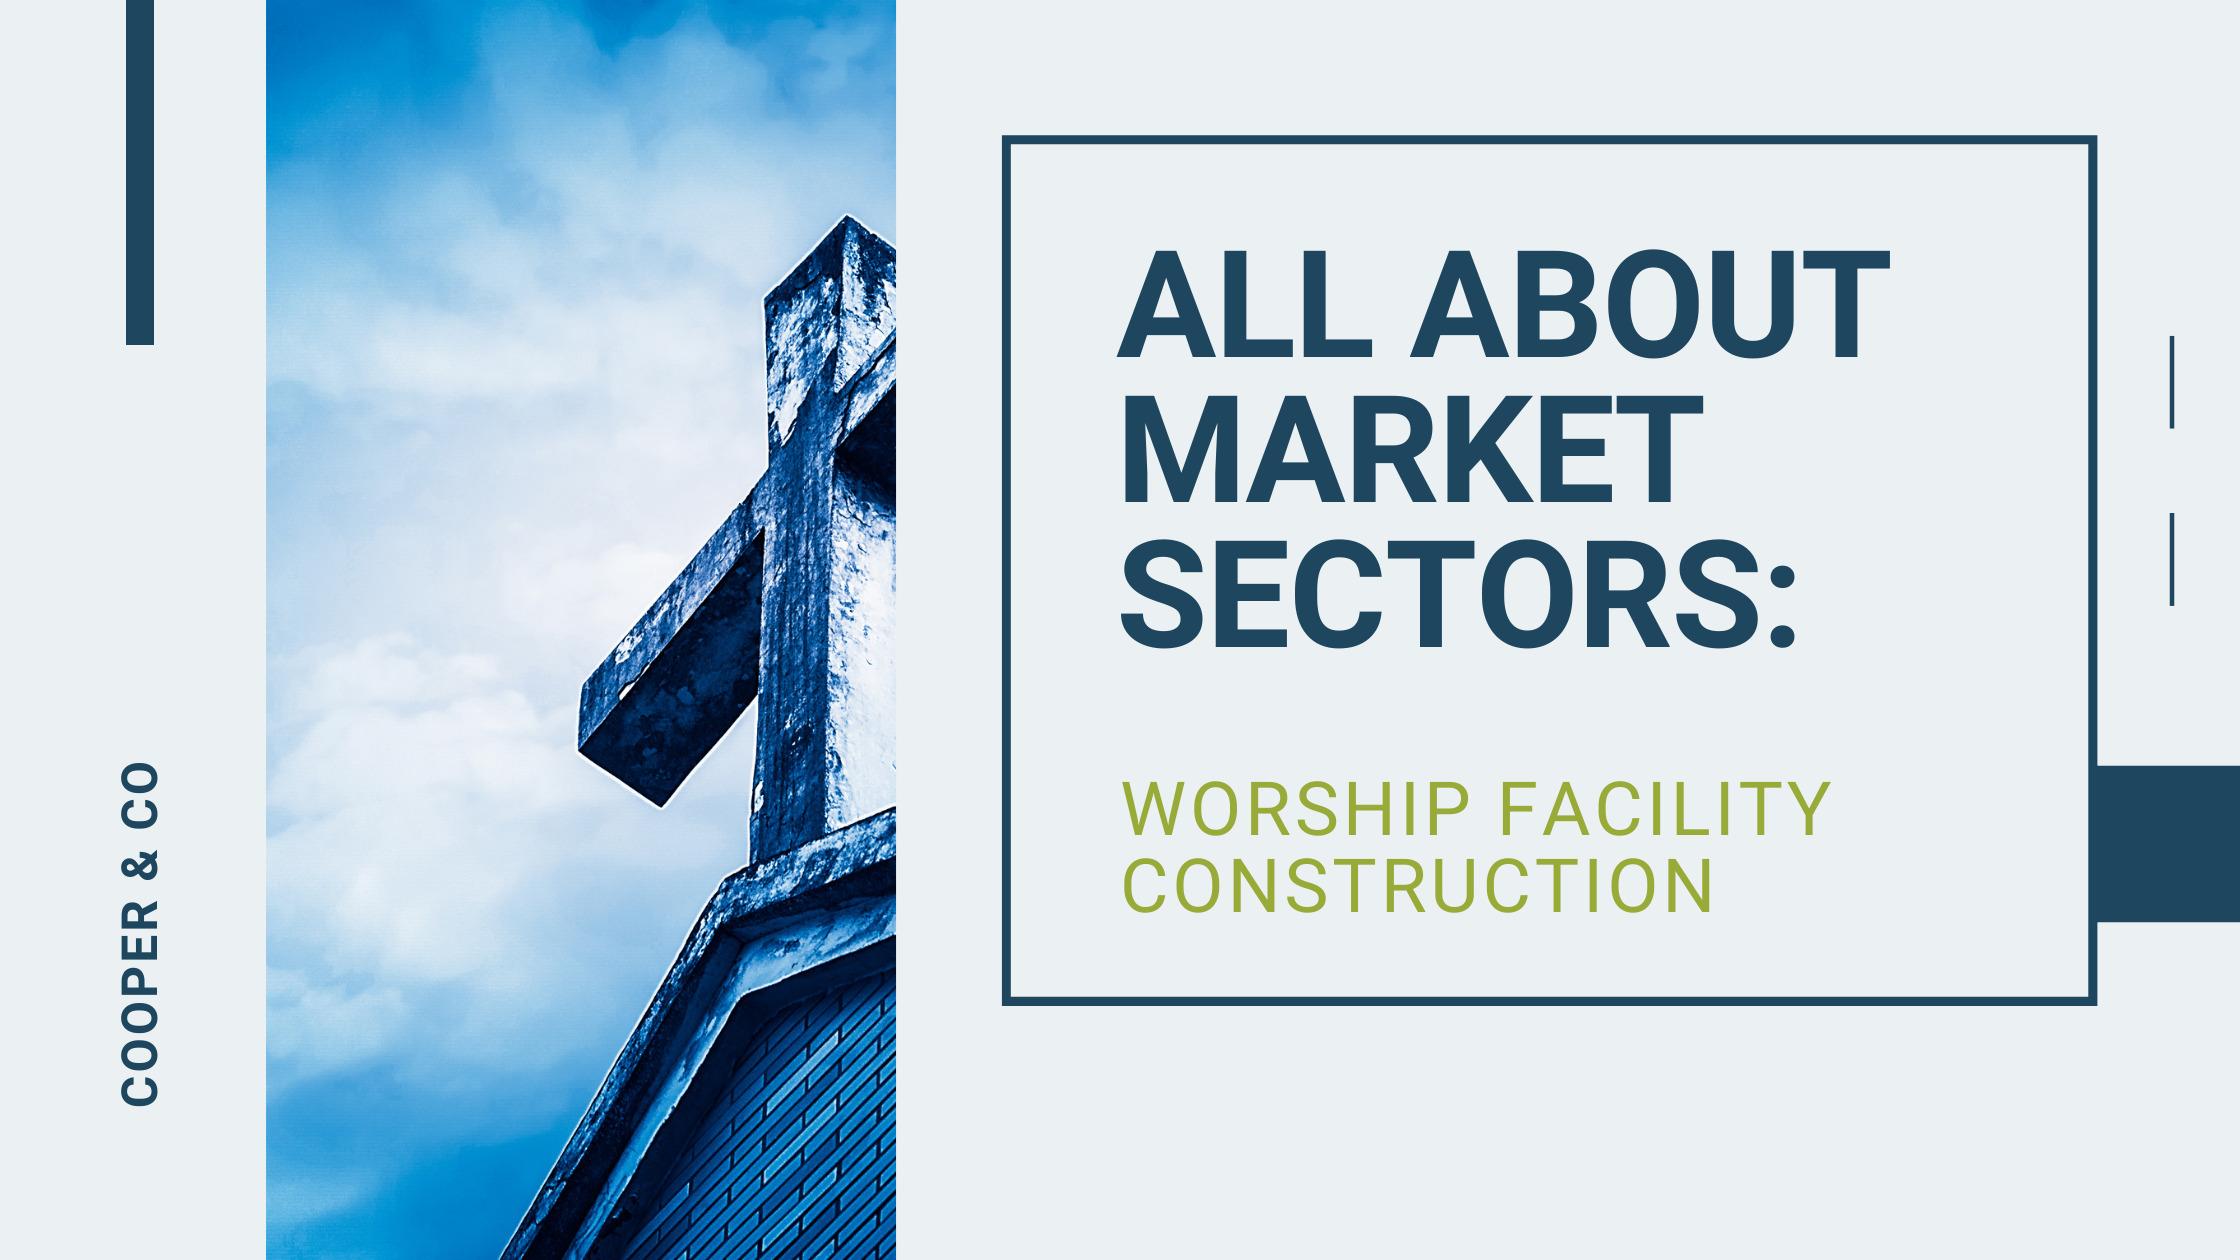 all about market sectors| Worship Facilities & Church Construction | Cooper & Company General Contractors